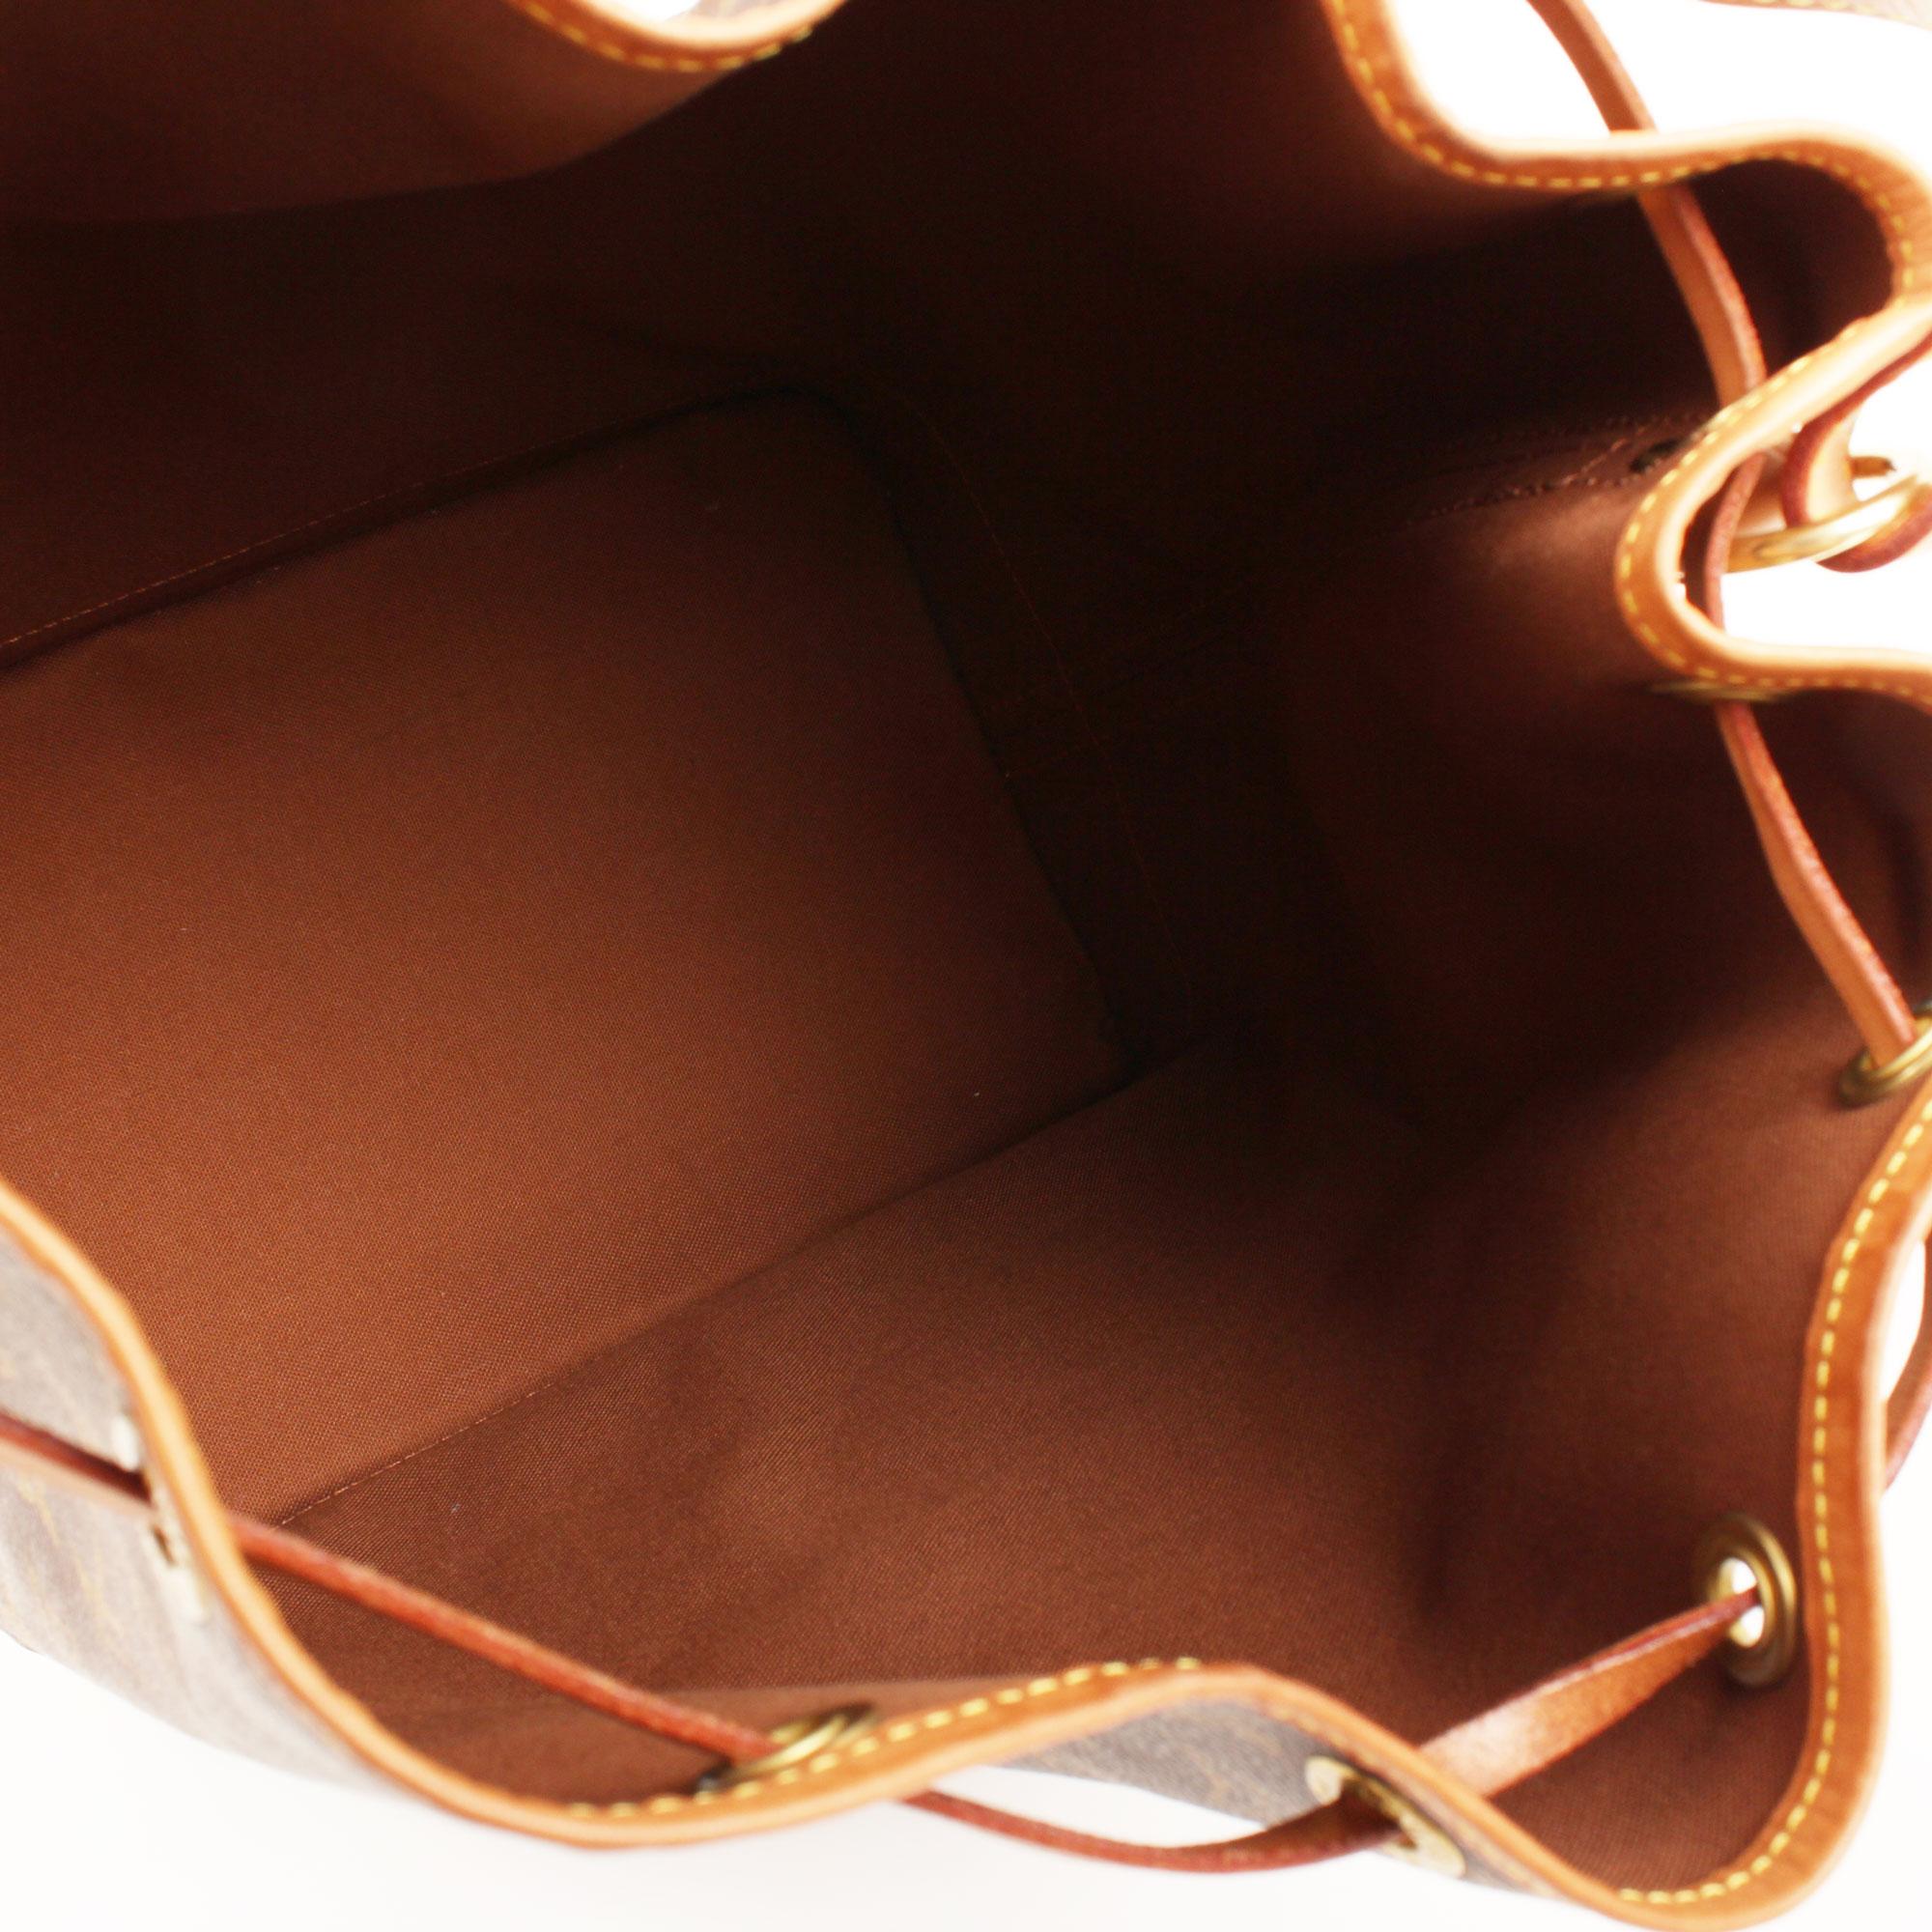 Interior image of louis vuitton noe monogram bag